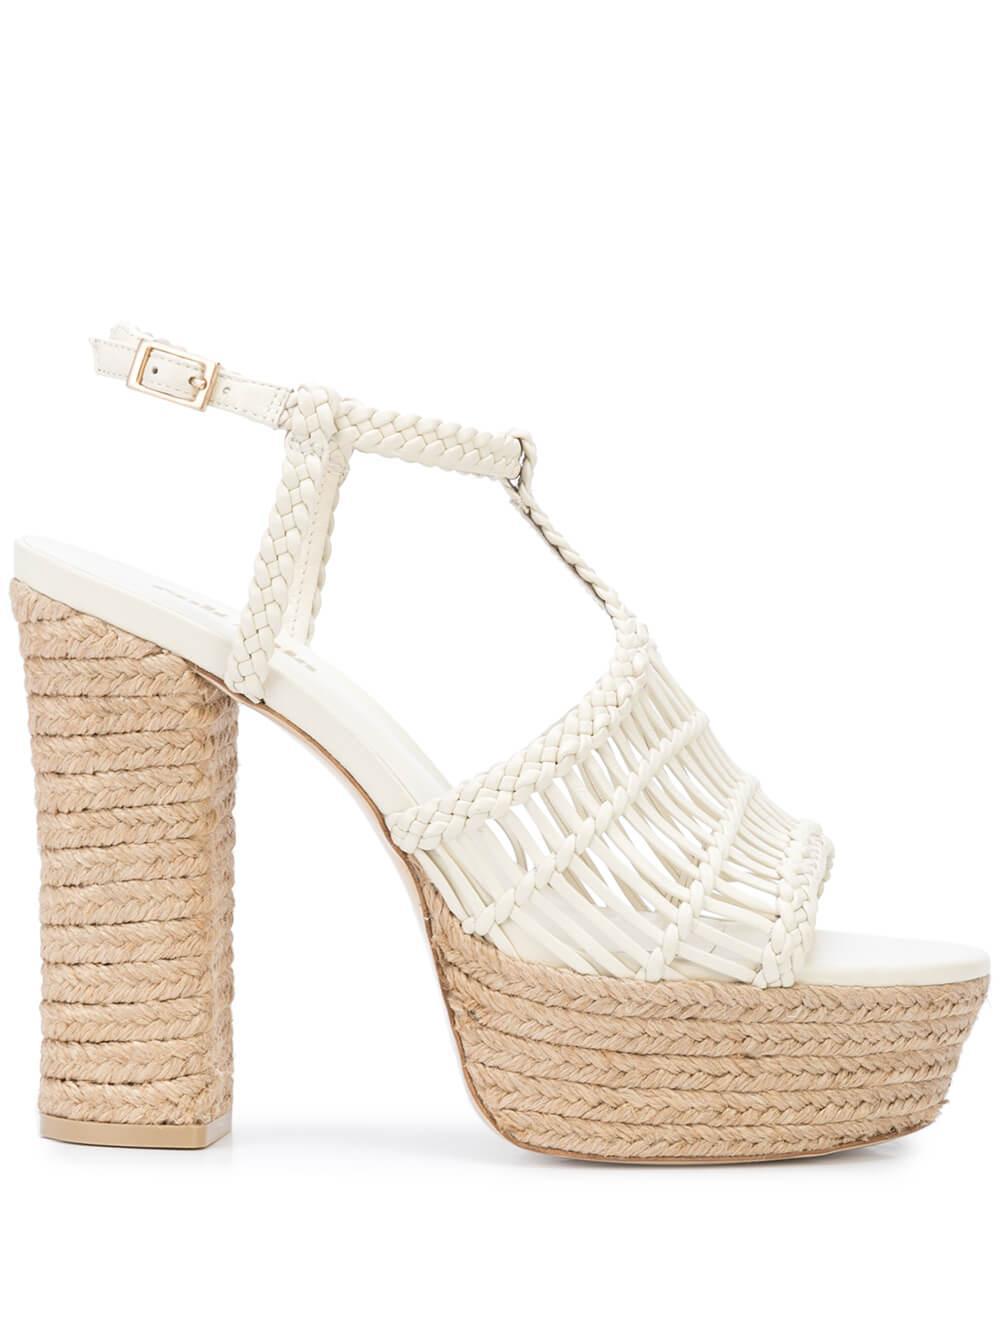 Thea Platform Woven Sandal With Ankle Strap Item # VES-02LT